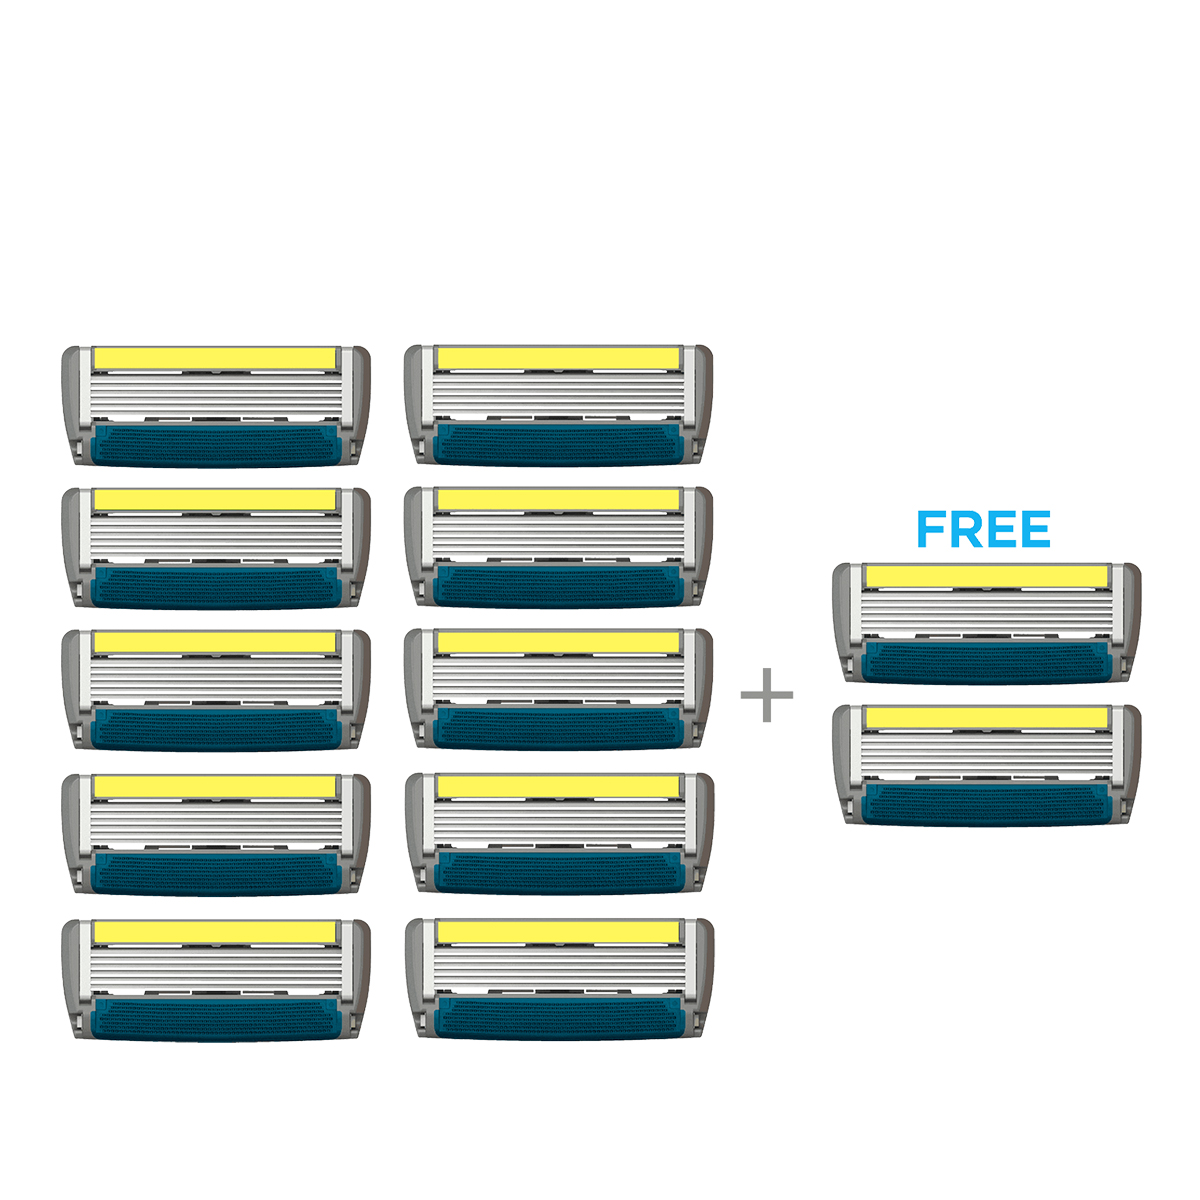 LetsShave | LetsShave Pro 6 Plus Shaving Blades - Pack of 10 + 2 Razor Blades Free